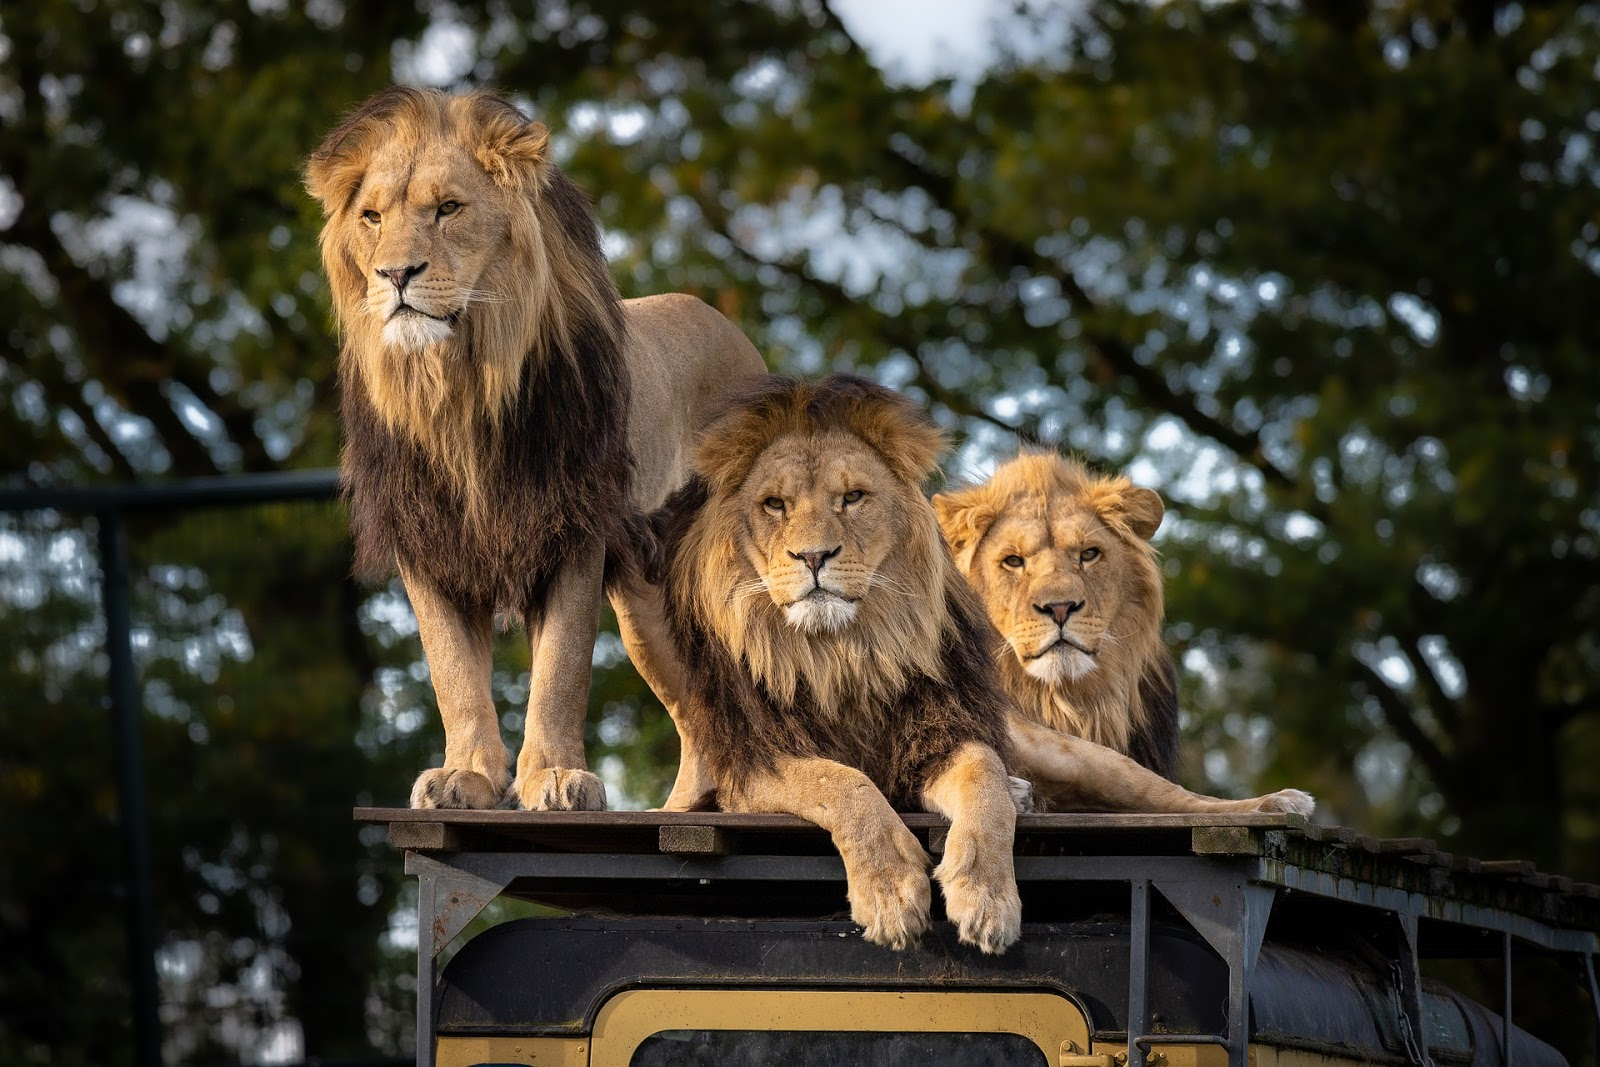 lion-zoo-africa-predator-animal,lion images